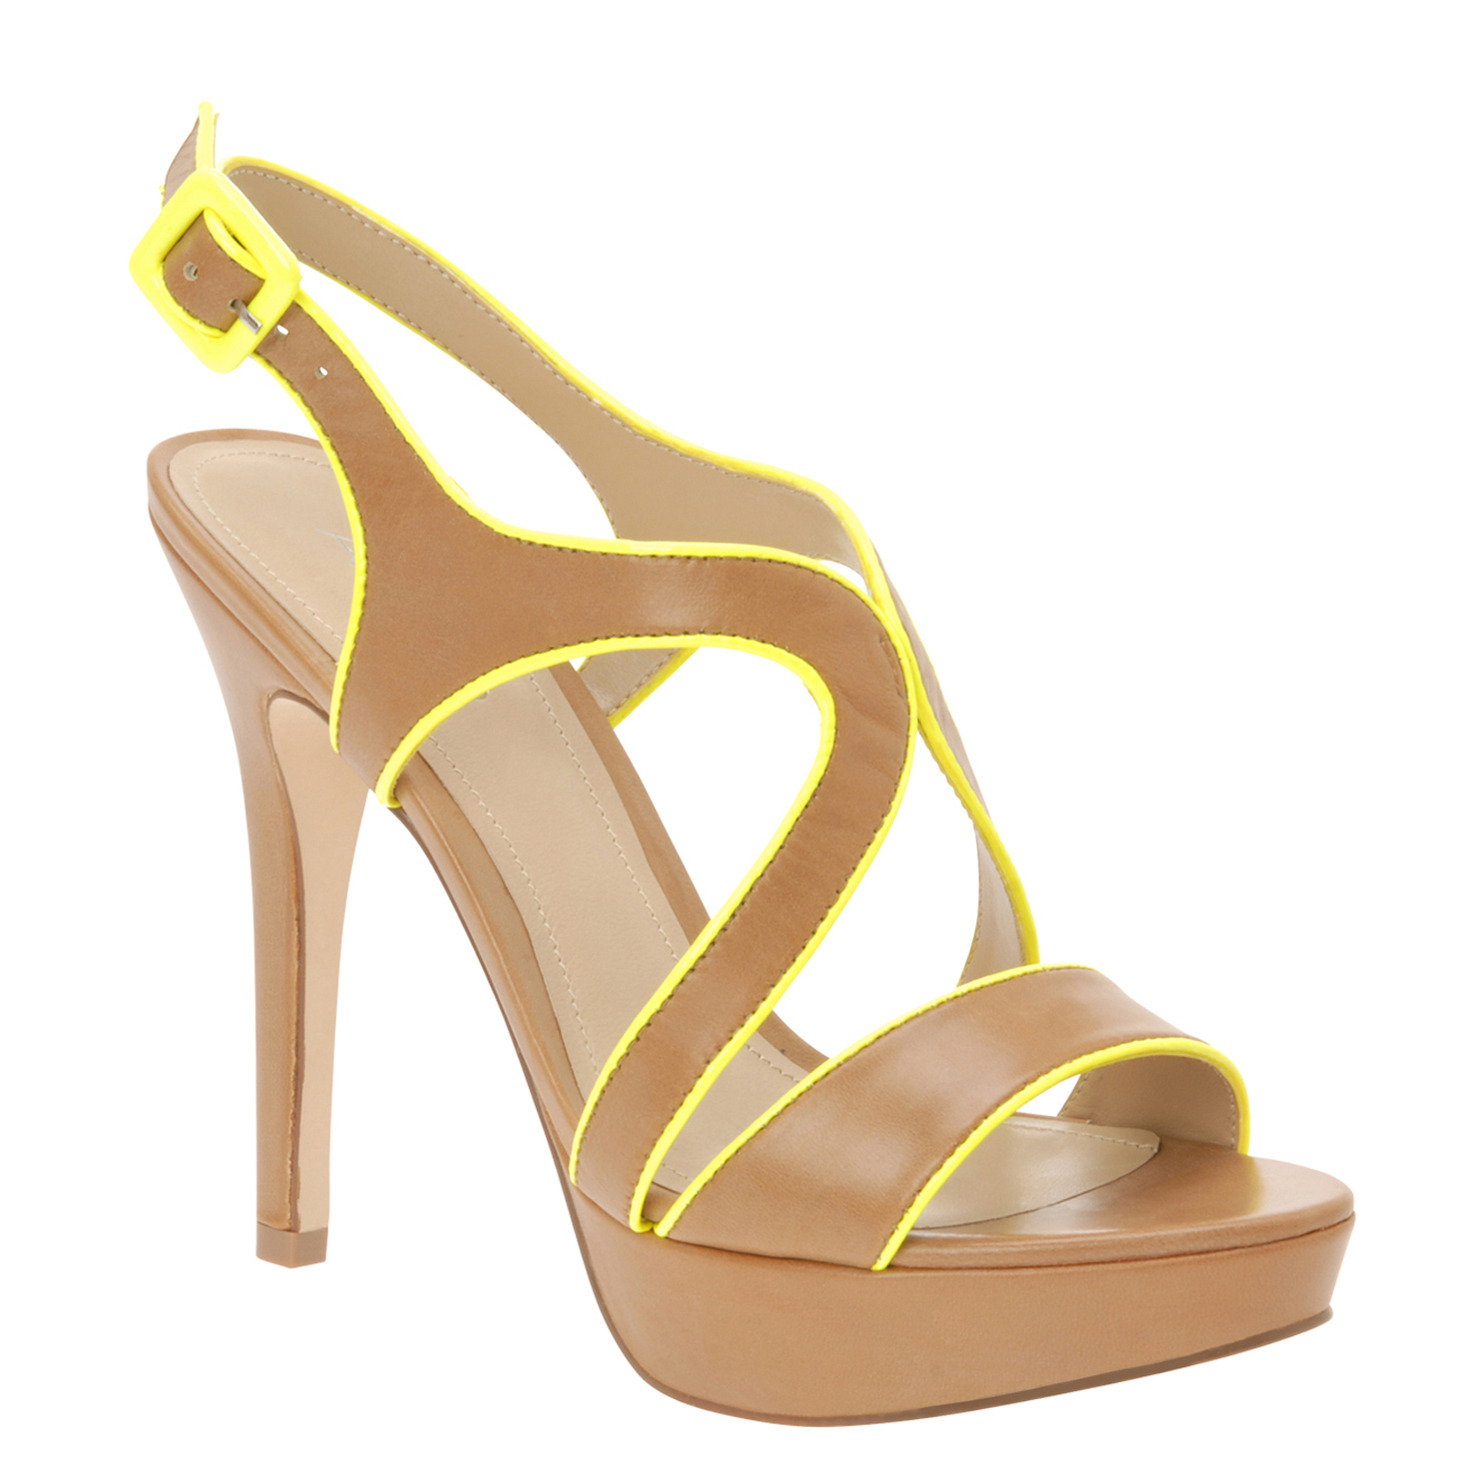 Mens Gladiator Sandals June 2014